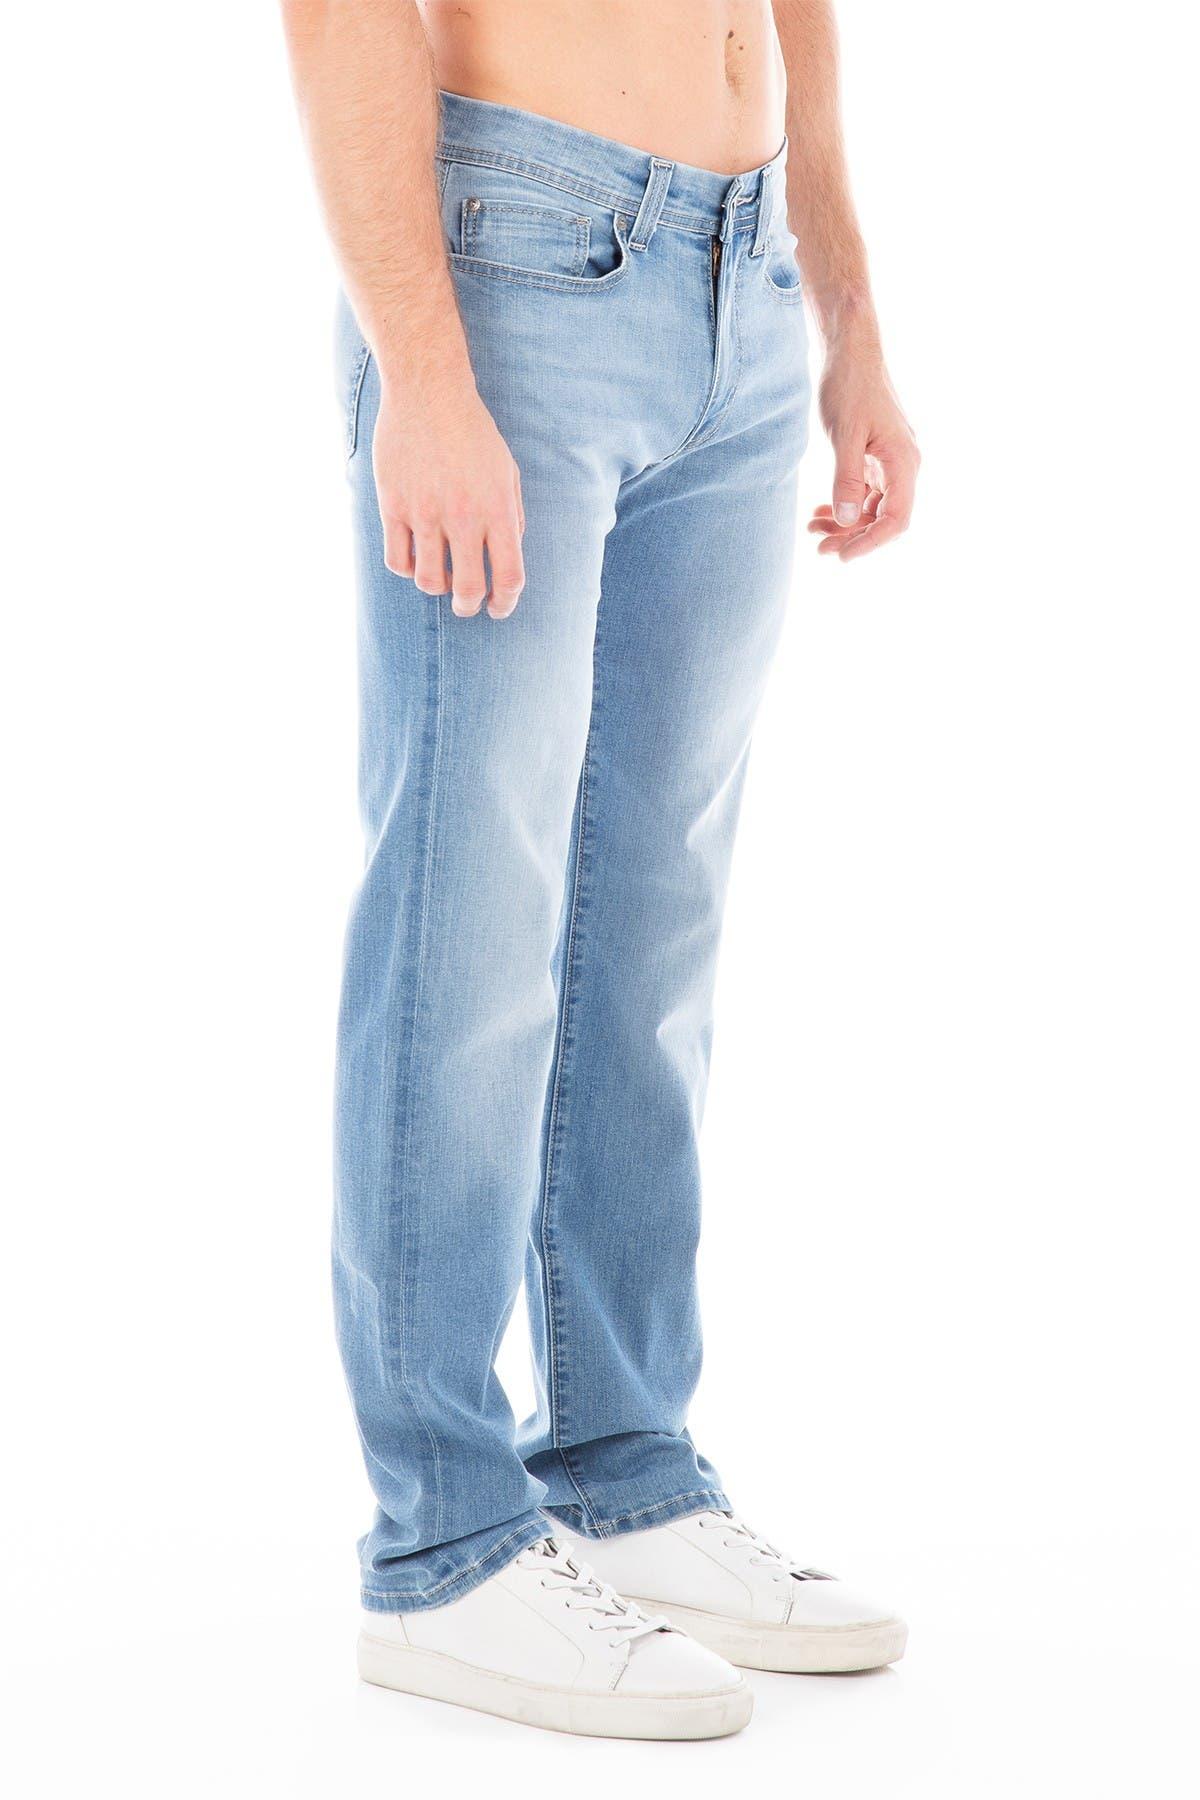 FIDELITY DENIM Jimmy Slim Straight Leg Jeans